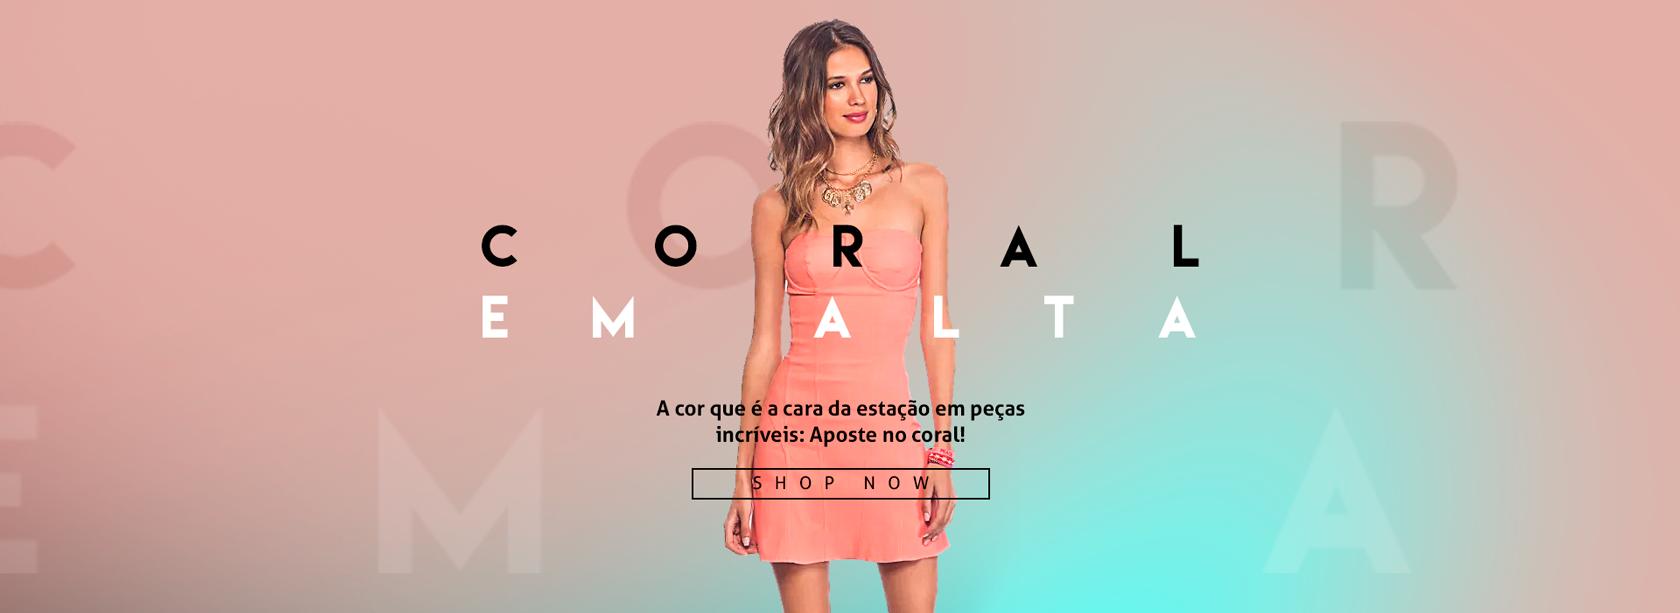 Coral Em Alta 09.01.2019